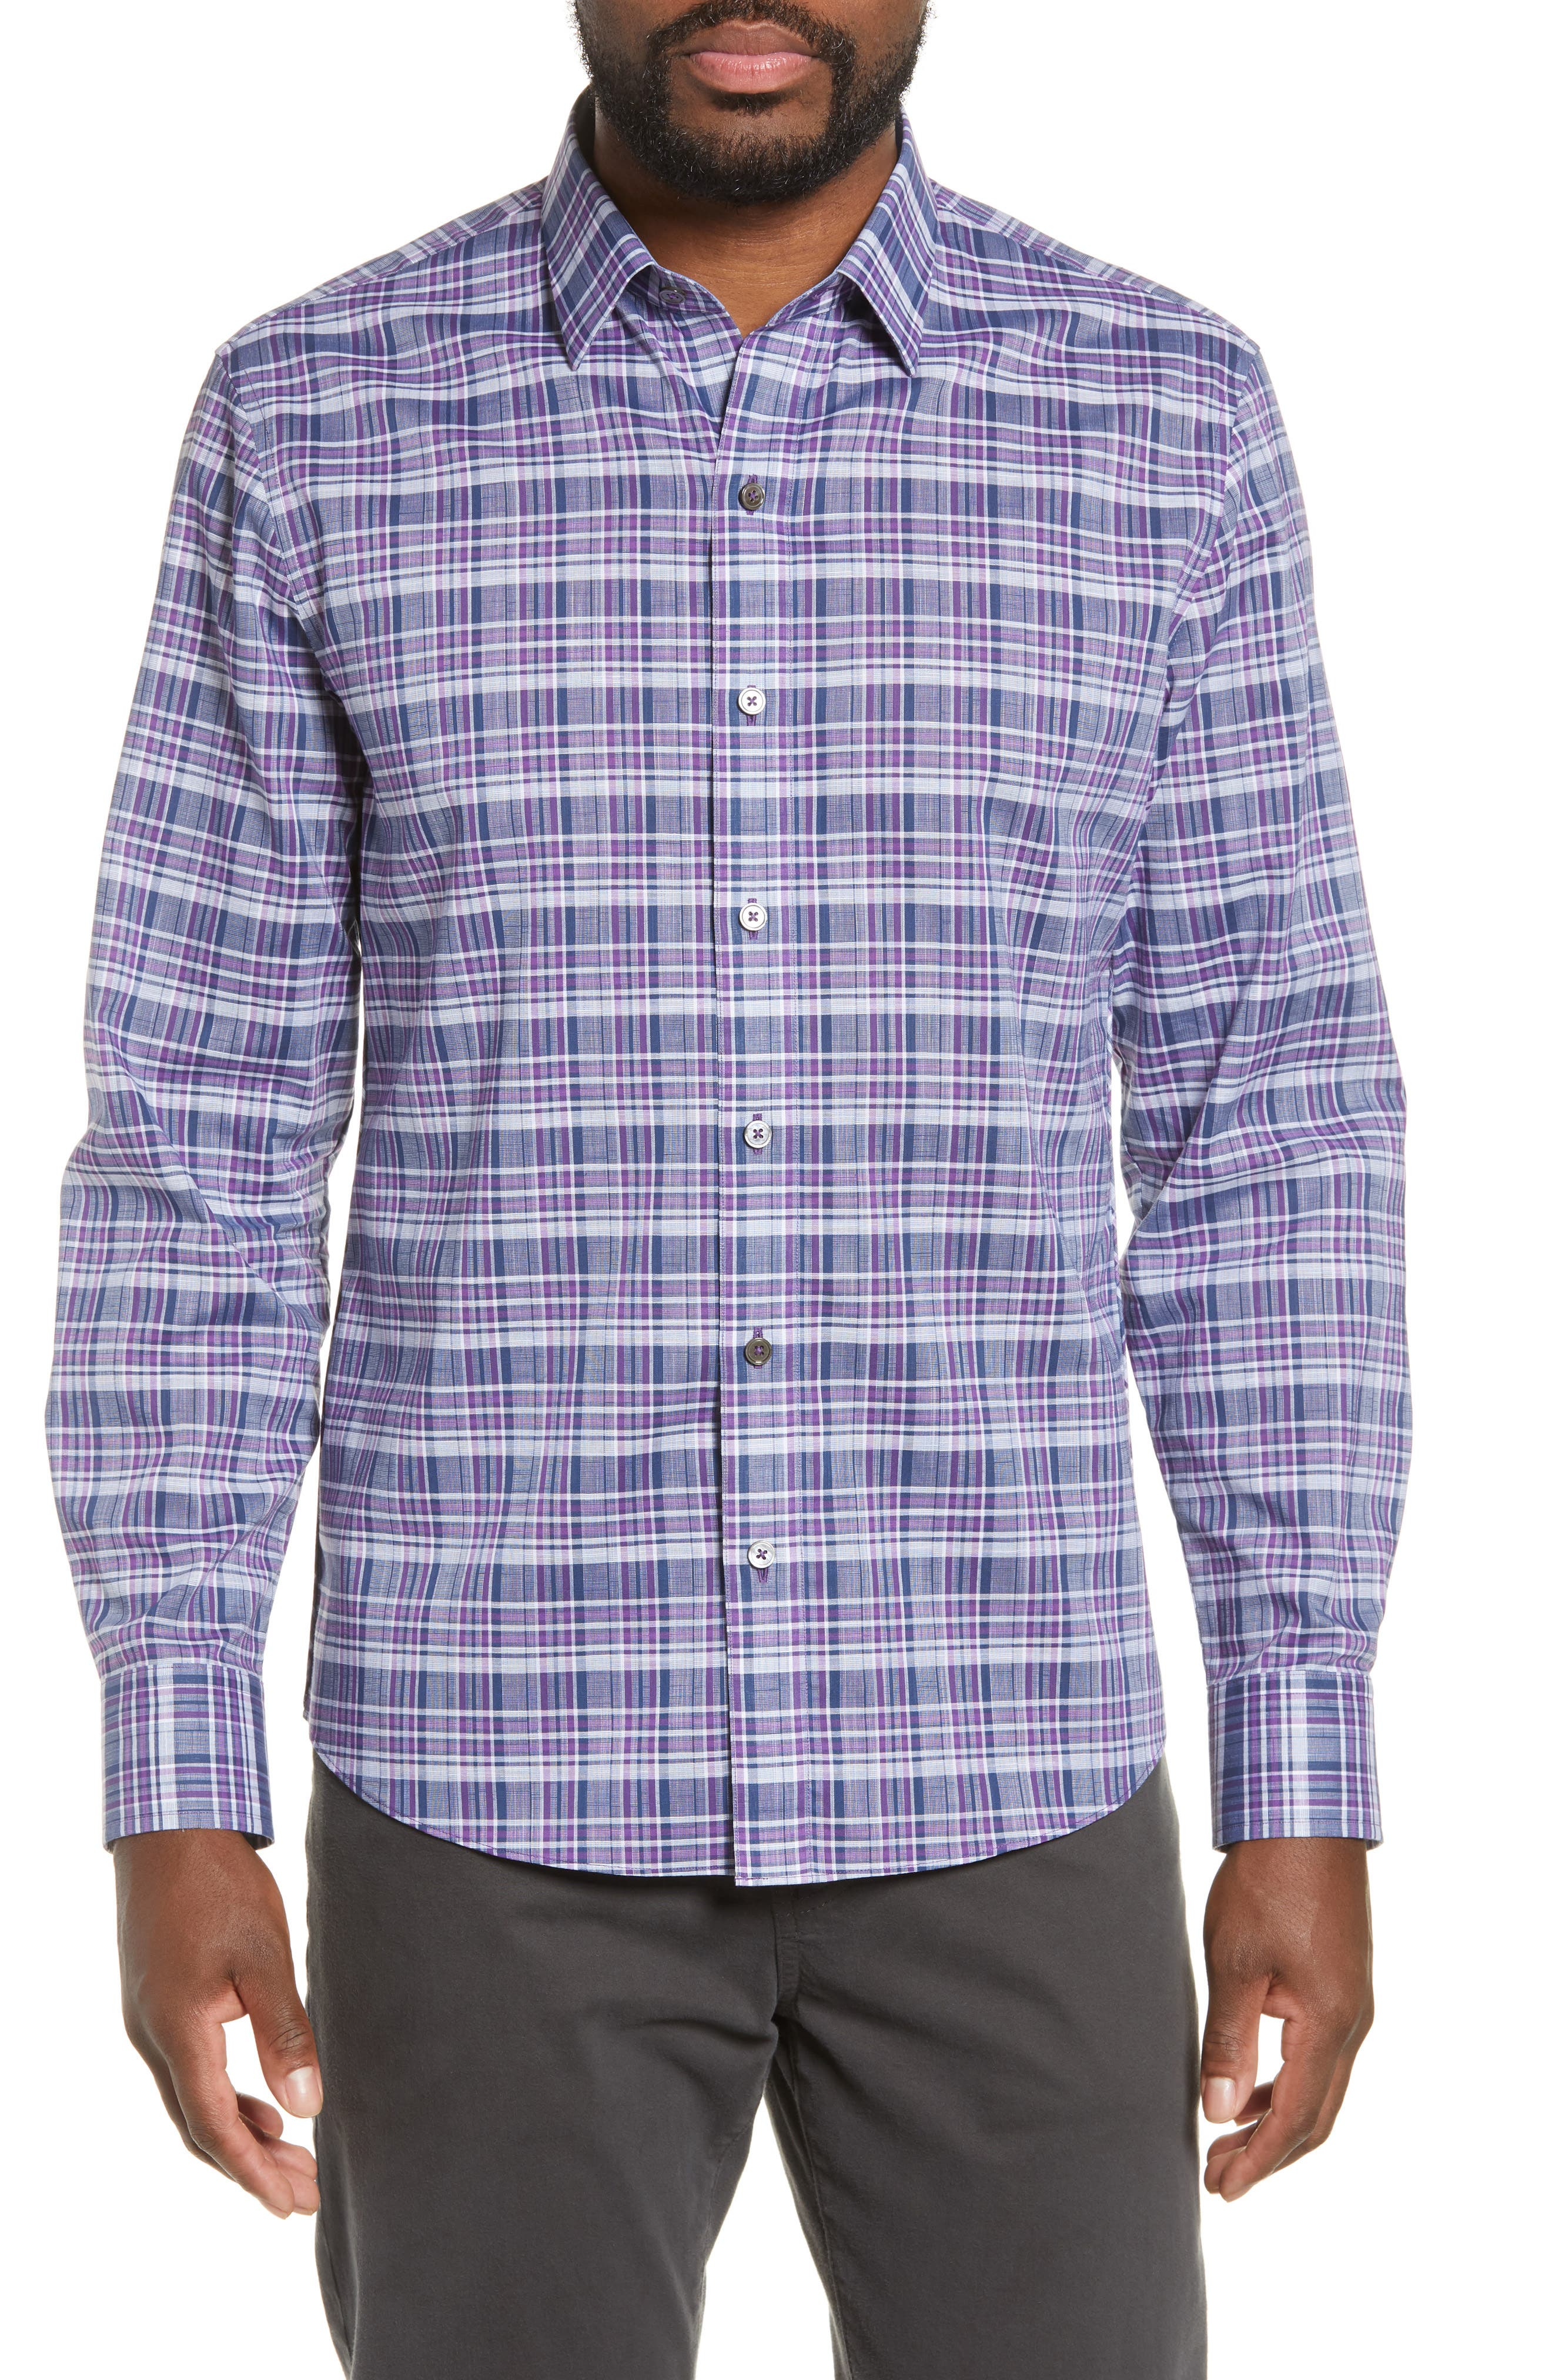 ZACHARY PRELL, Caro Regular Fit Sport Shirt, Main thumbnail 1, color, PURPLE